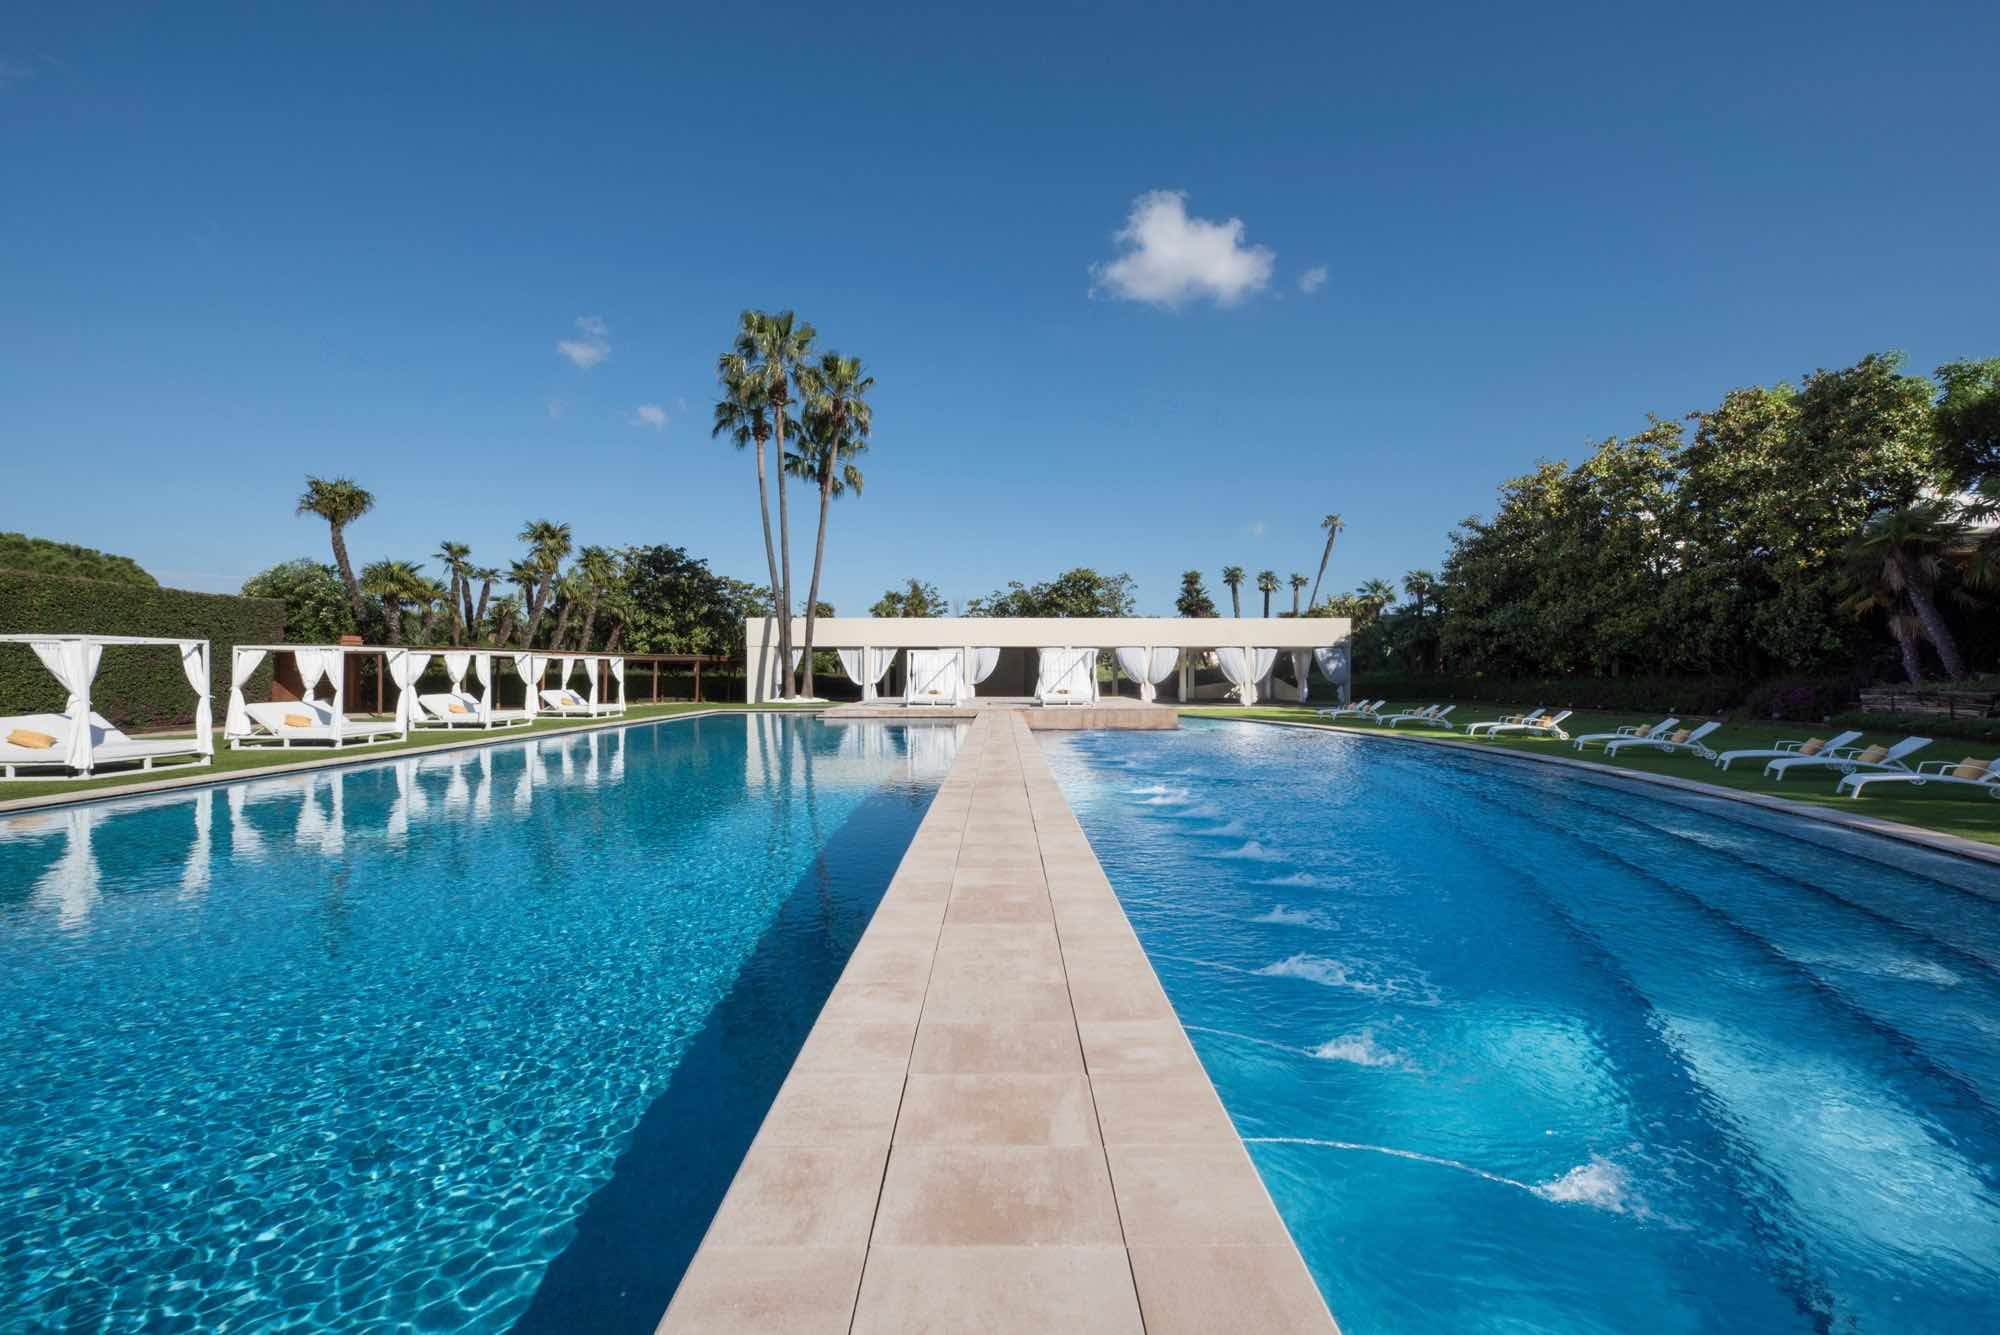 Fairmont Barcelona Rey Juan Carlos I outdoor swimming pool